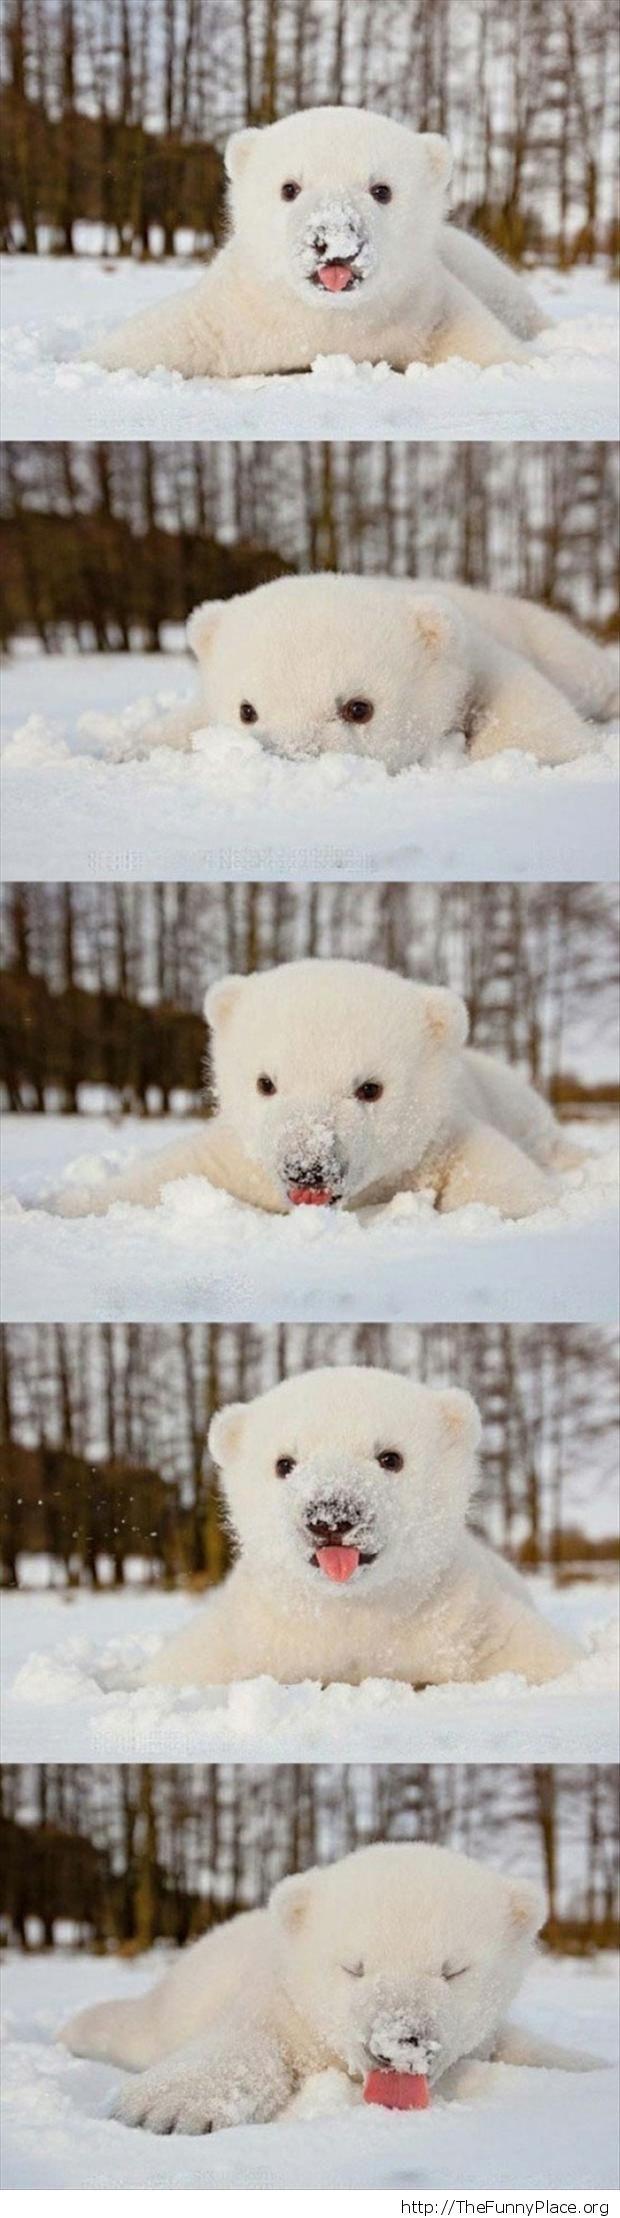 Sweet cub